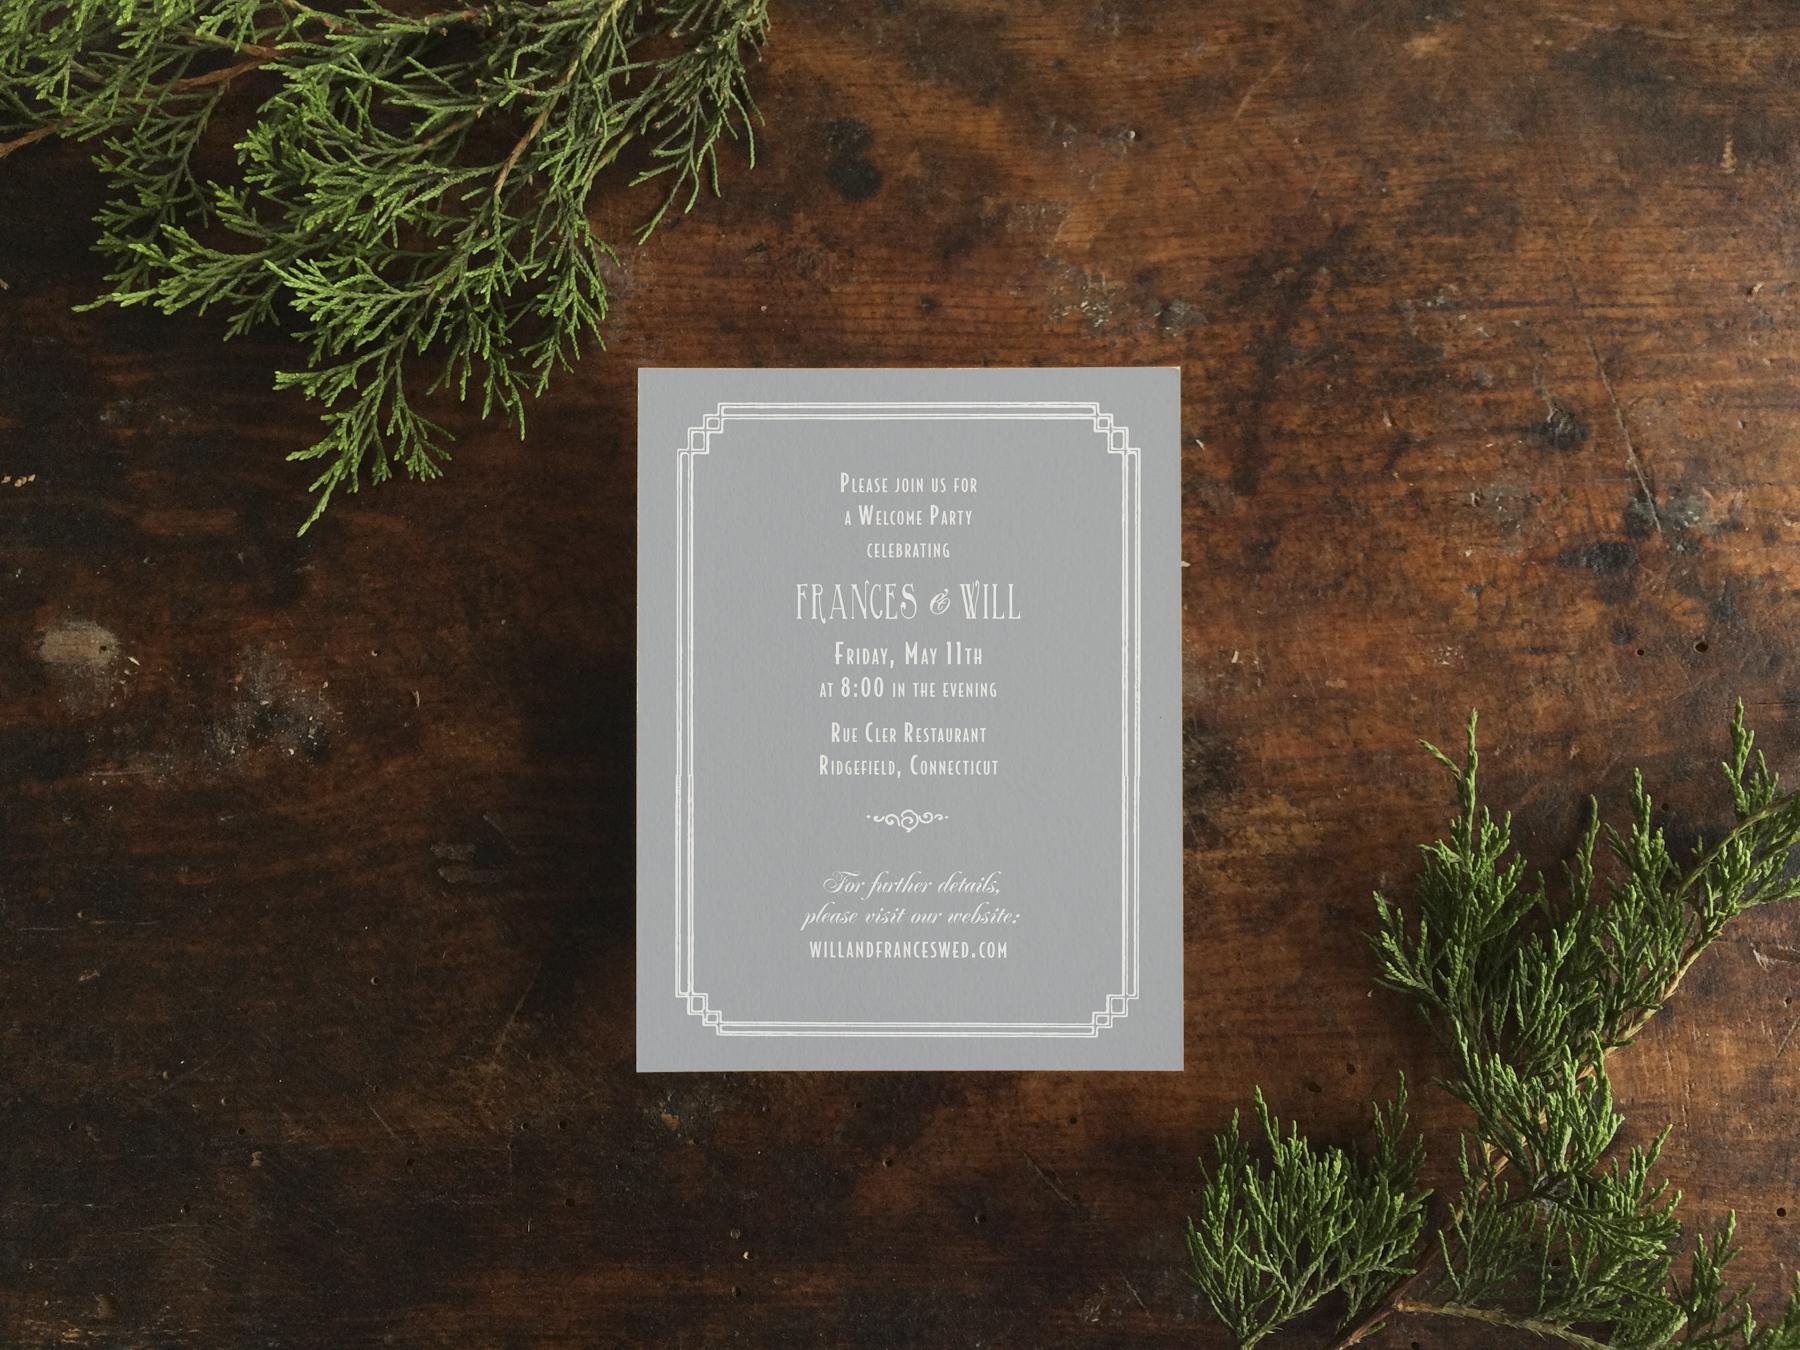 artnouveau-wedding-detail-card.jpg